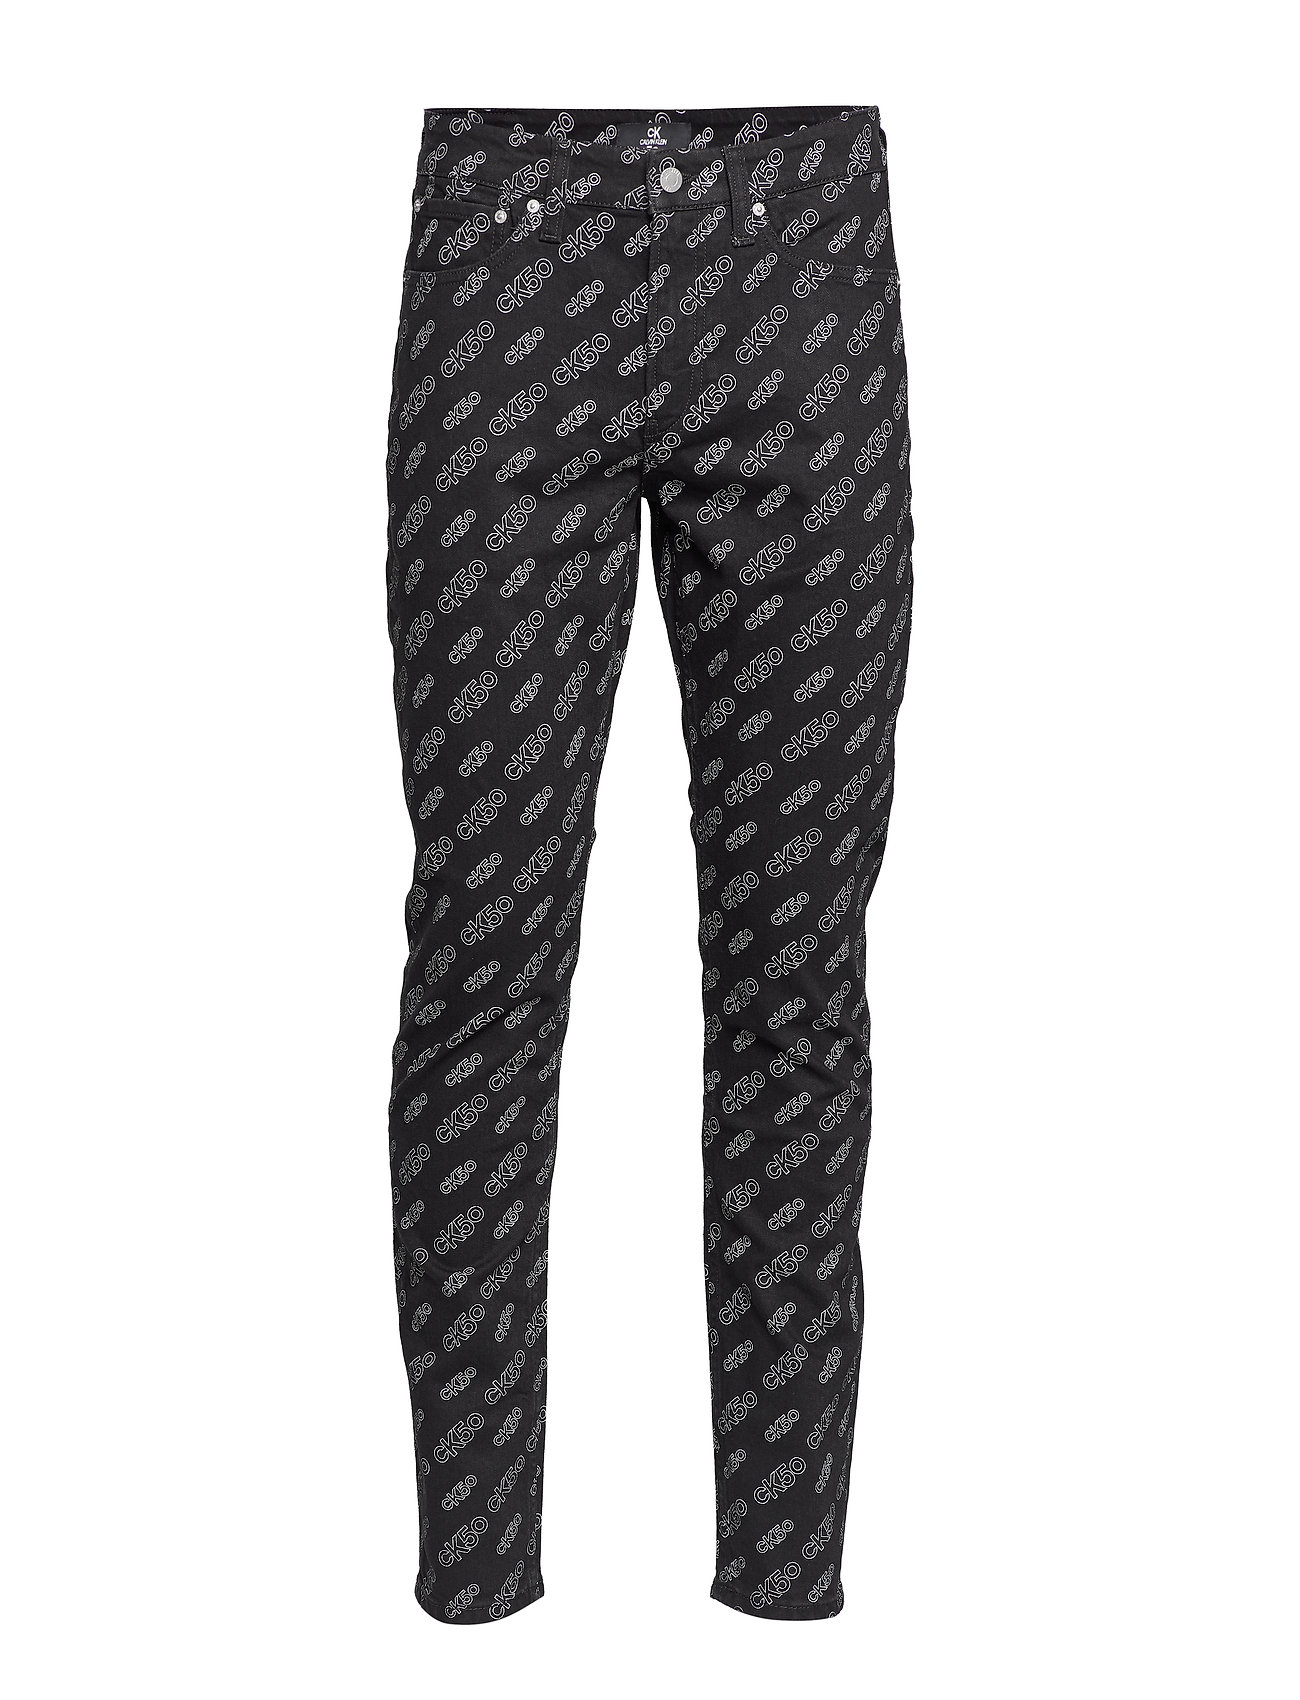 Calvin Klein Jeans CKJ 058 SLIM TAPER - BA300 BLACK AOP